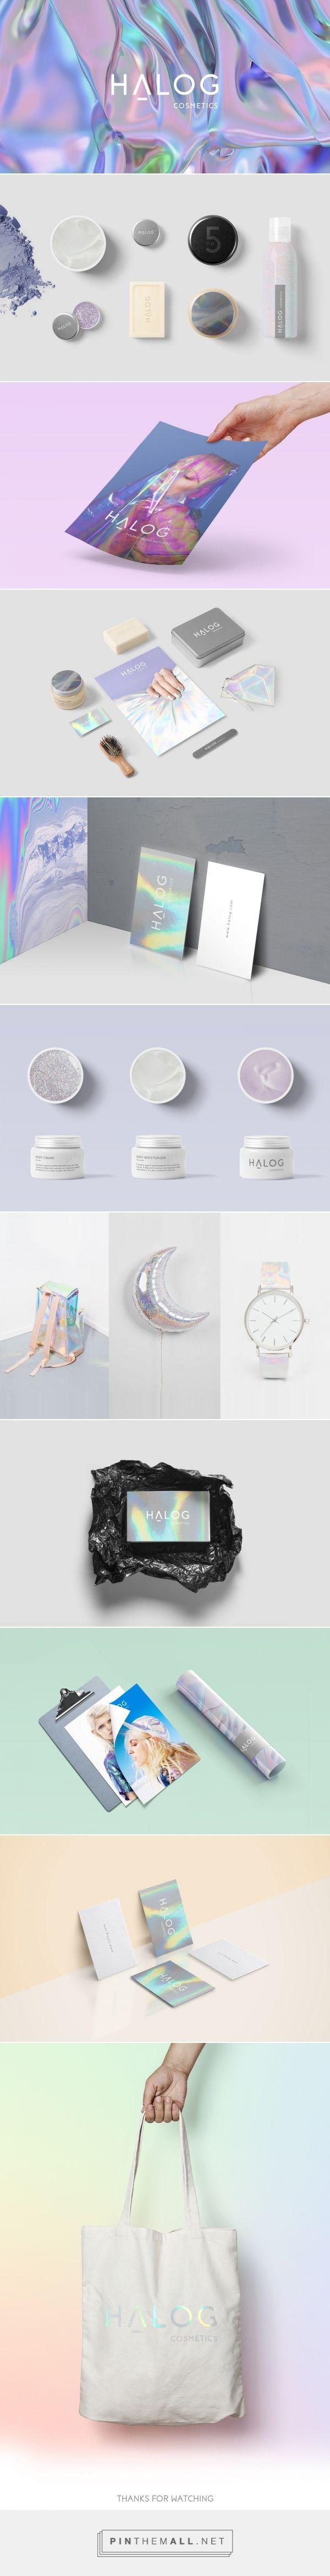 Halog Cosmetics Branding by Katerina Petridou | Fivestar Branding Agency – Design and Branding Agency & Inspiration Gallery